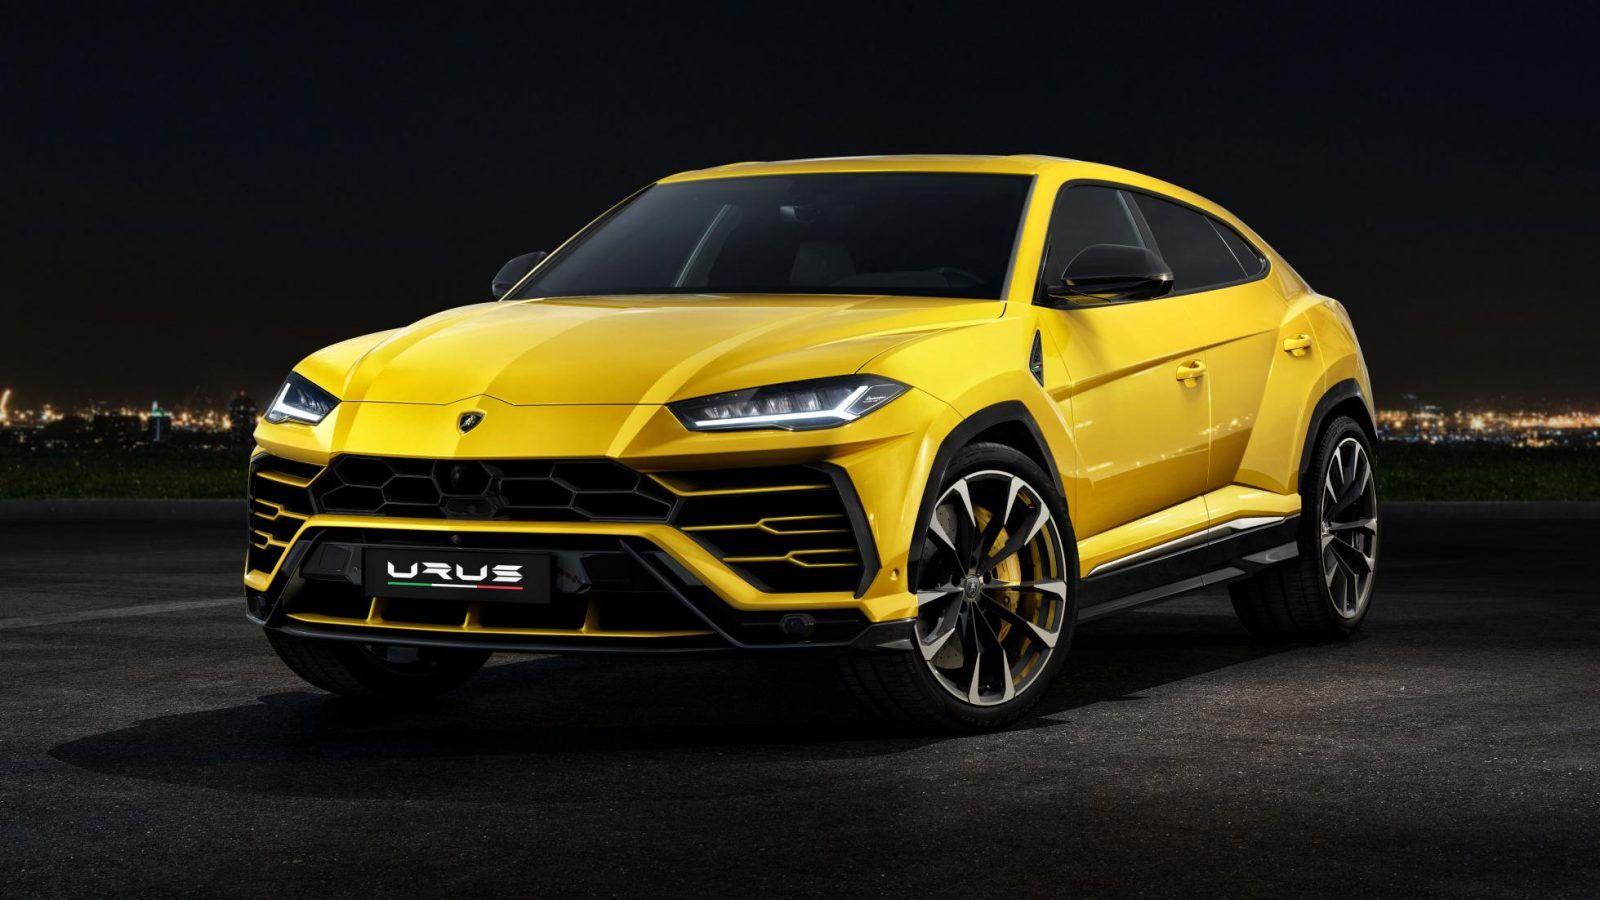 2019 Lamborghini Urus World Premiere Of Ssuv Son Of A Rambo Lambo Car Shopping Car Revs Daily Com In 2020 Hybrid Car Suv Super Cars